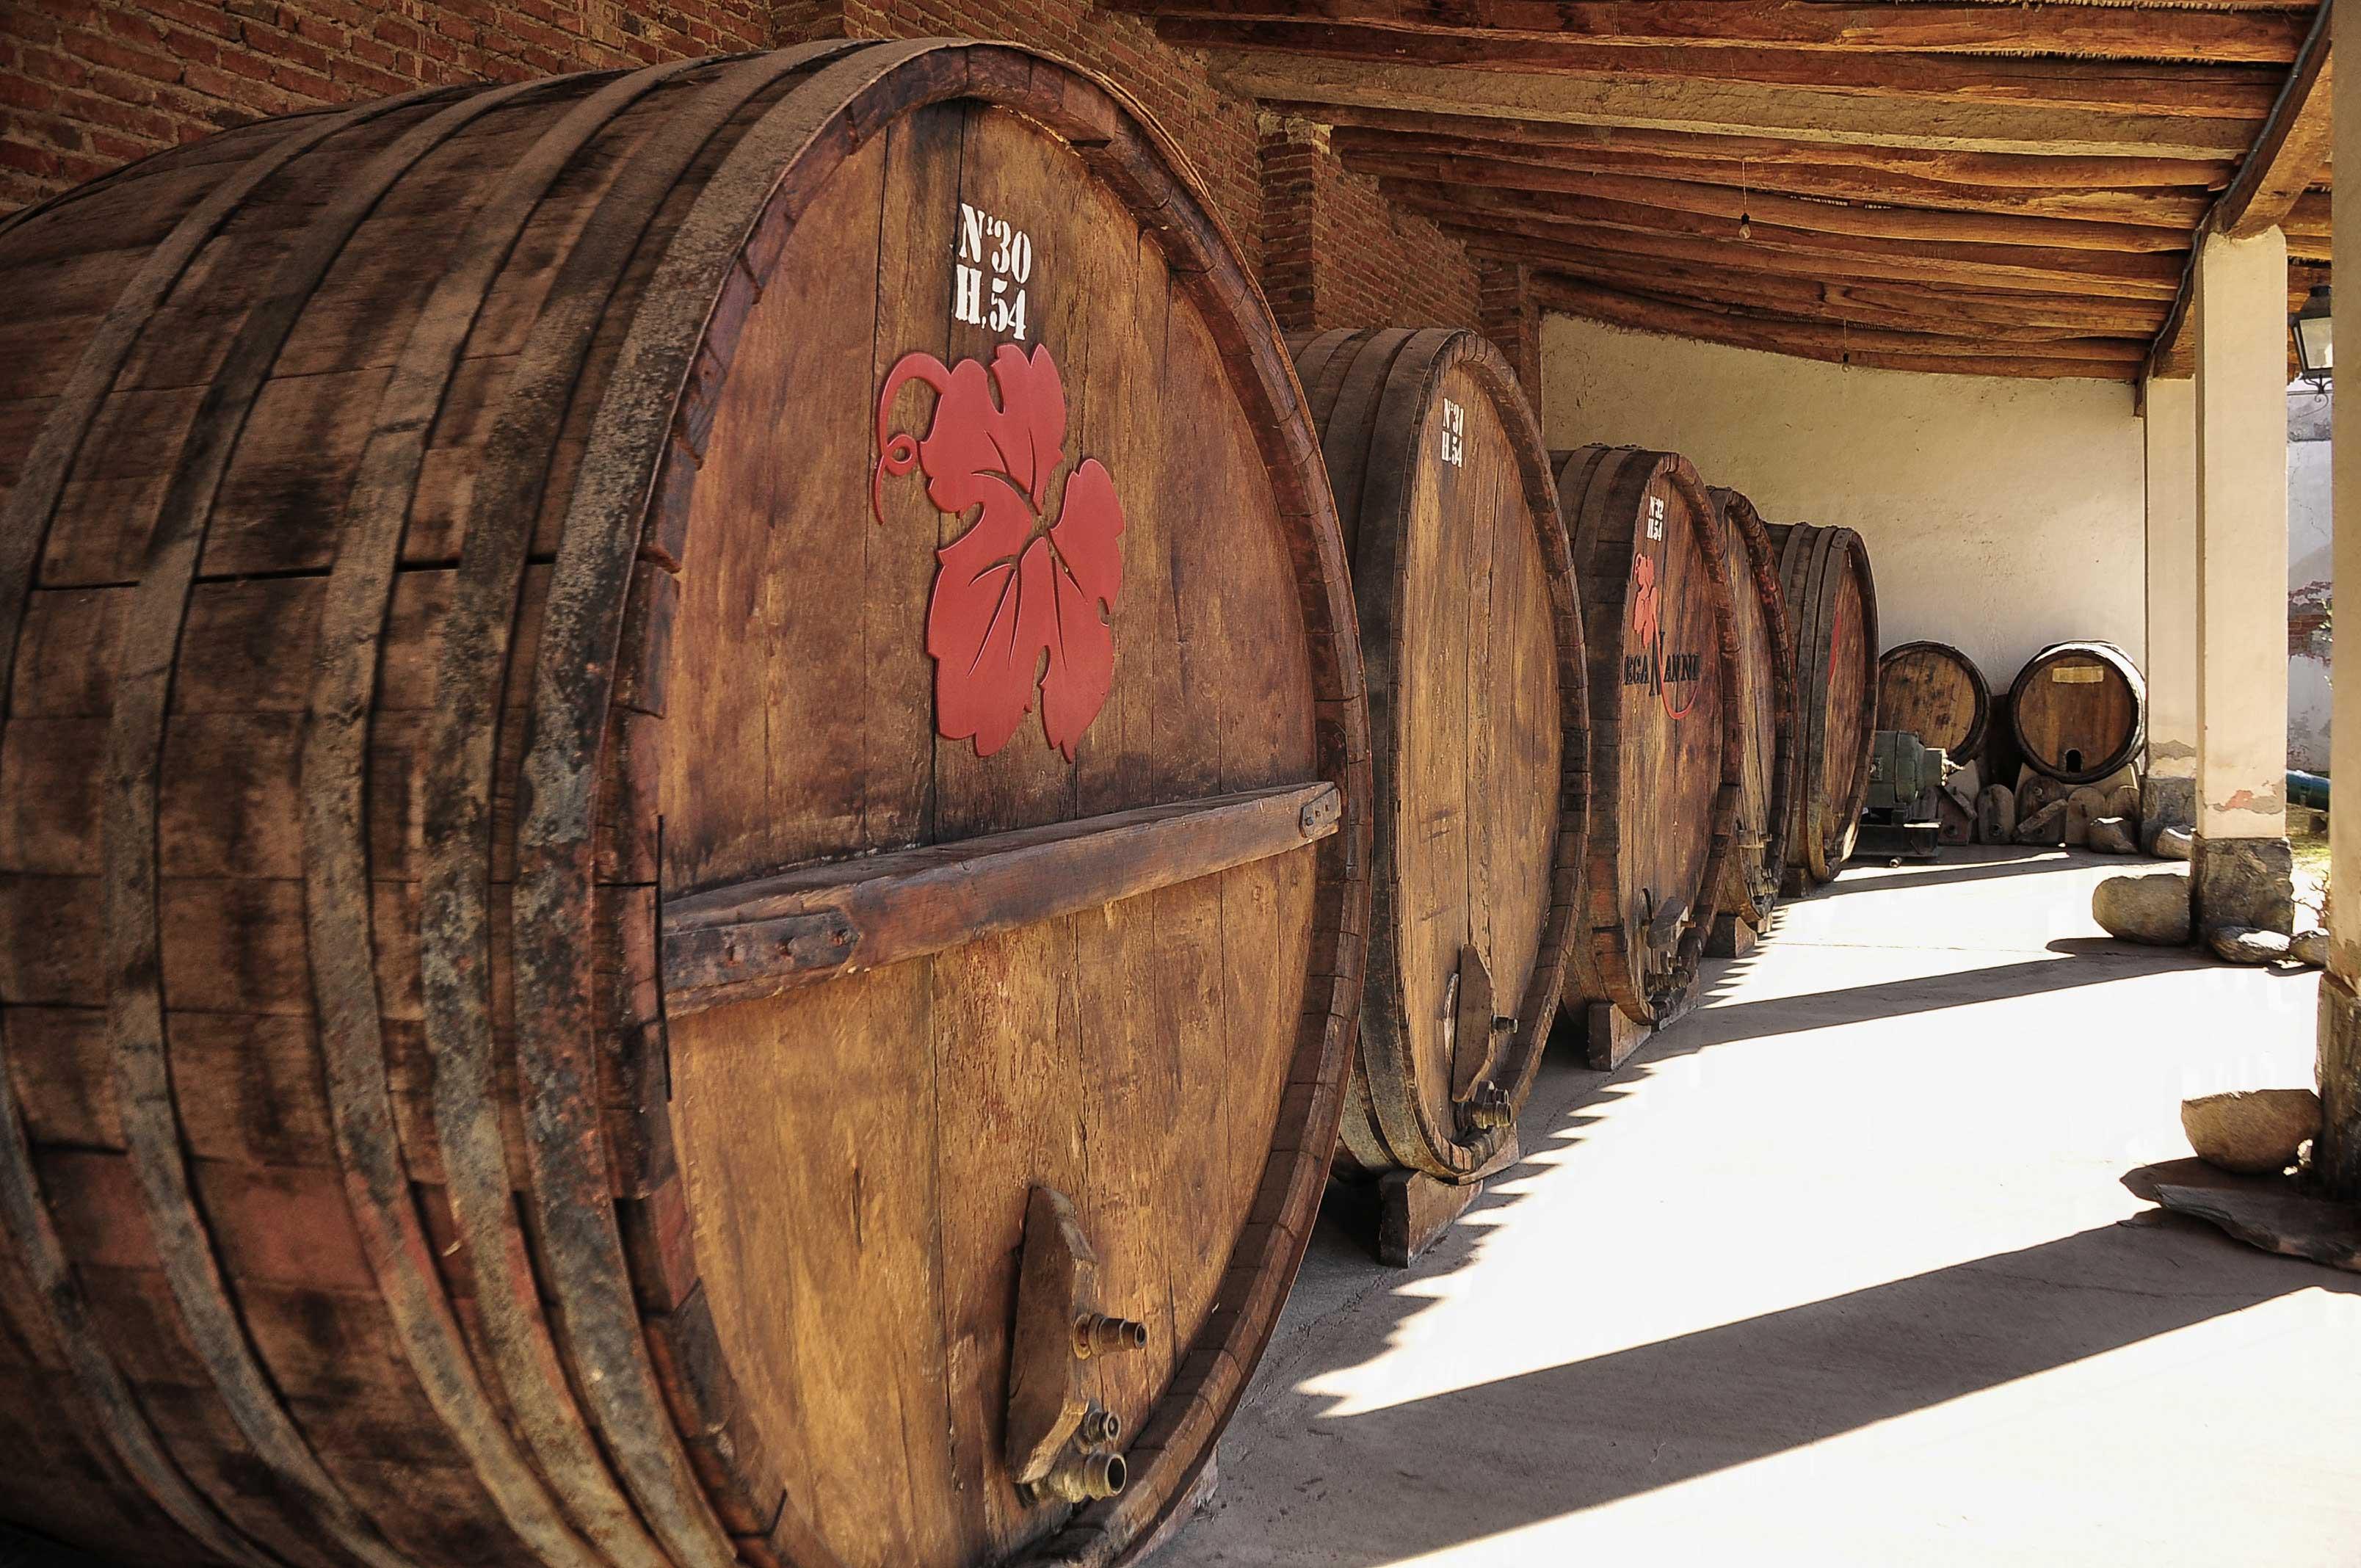 Filebig Wine Barrels Cafayete Argentina 7285509628jpg